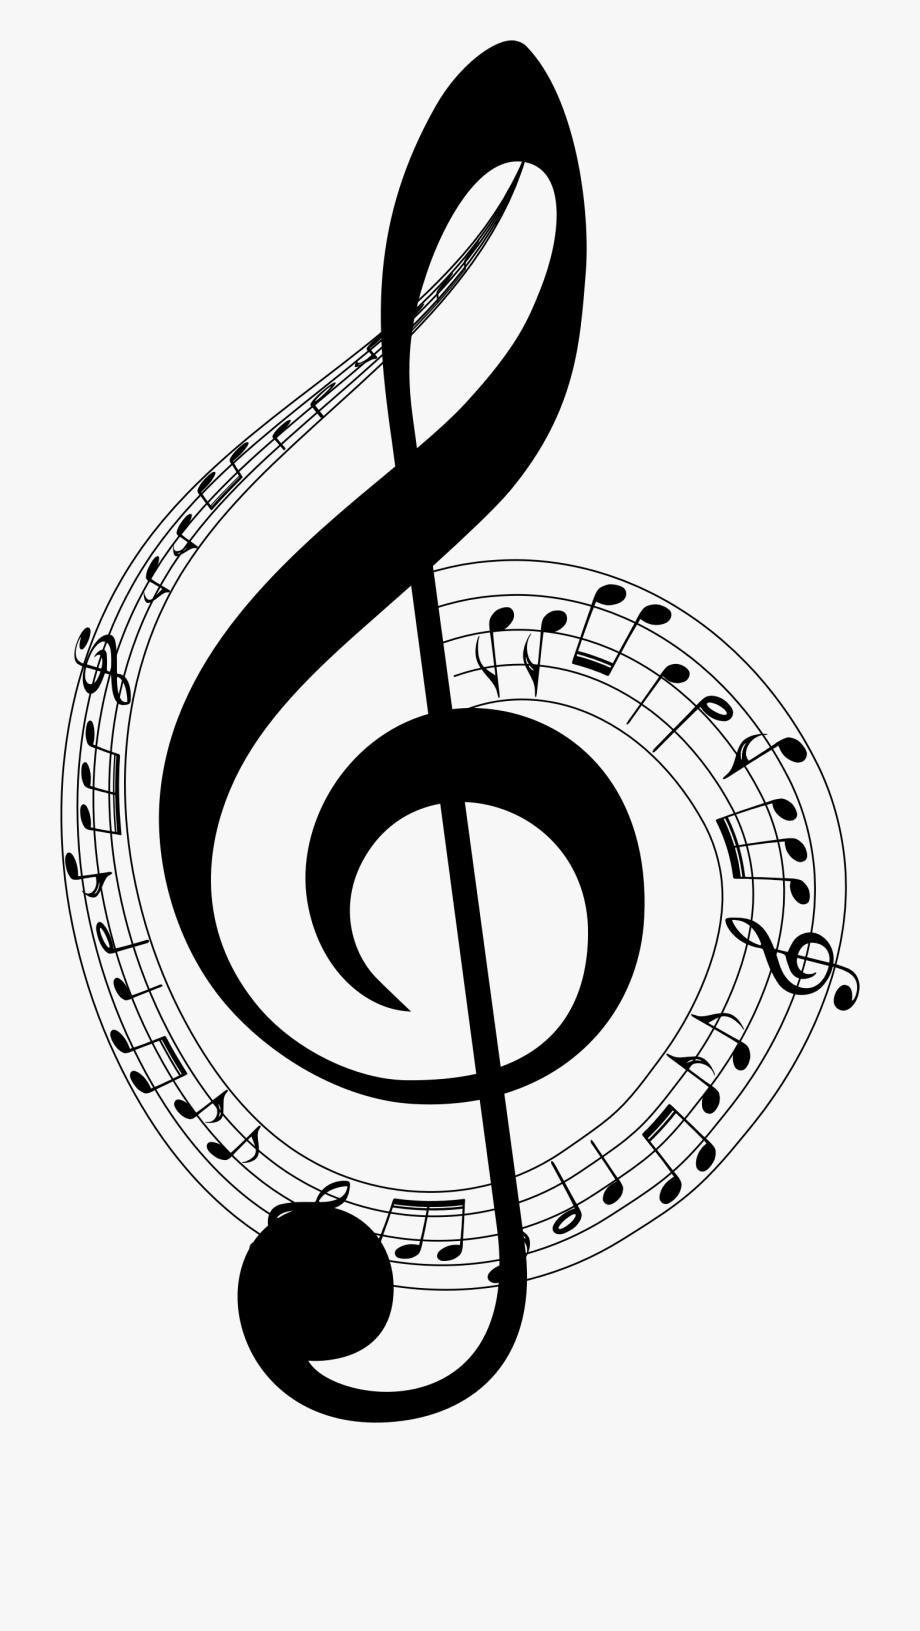 Musical Typography Medium Image Png.